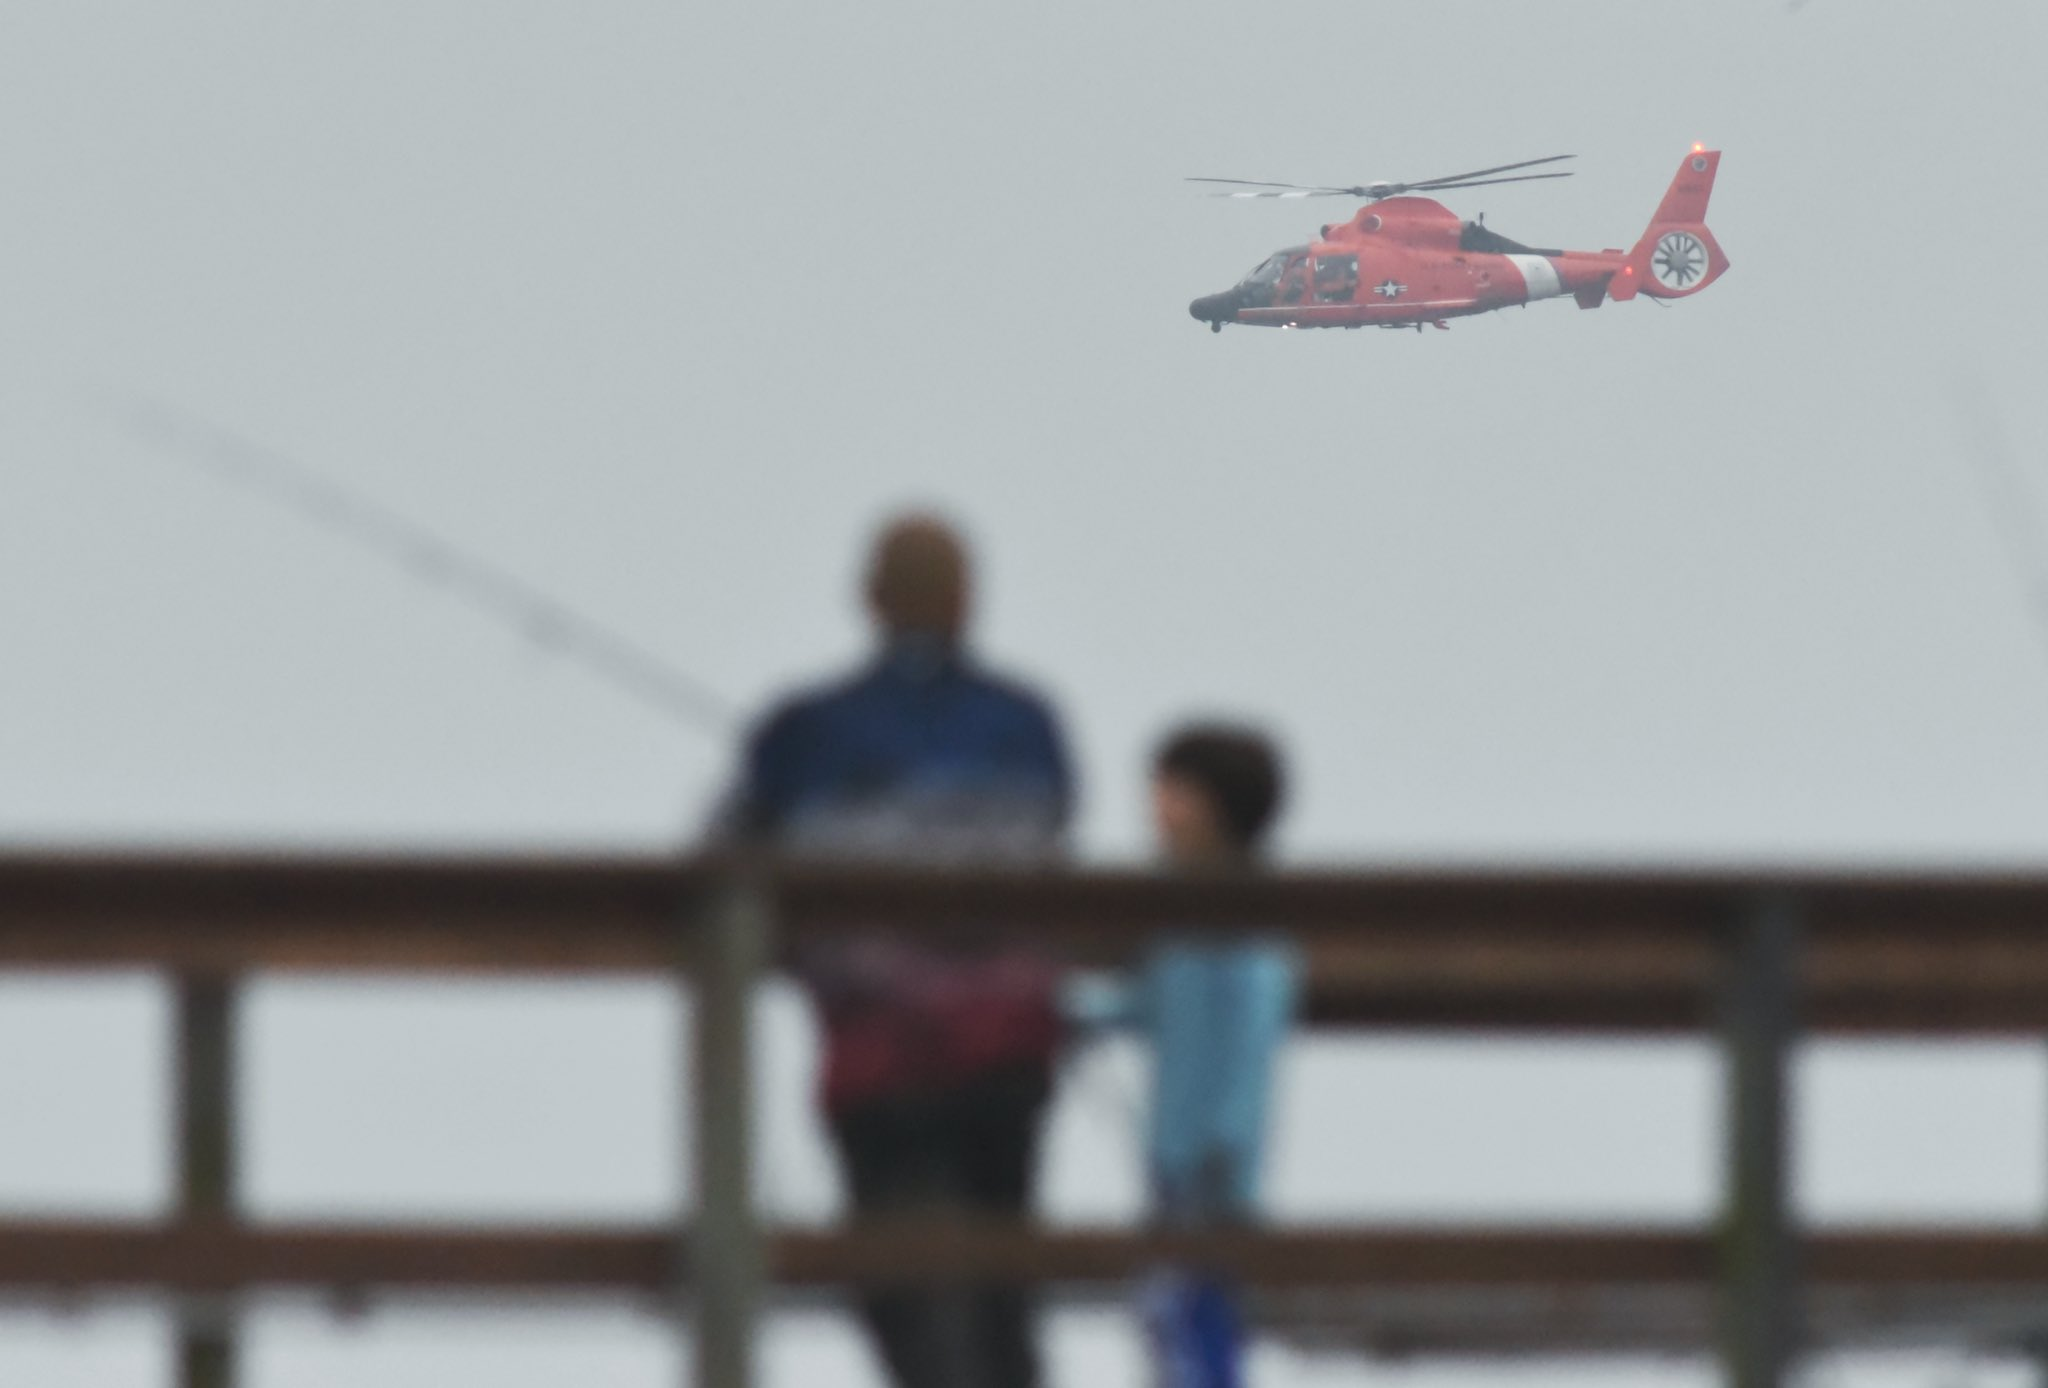 Search teams locate debris from plane crash off the Isla Vista coast, recovery mission underway